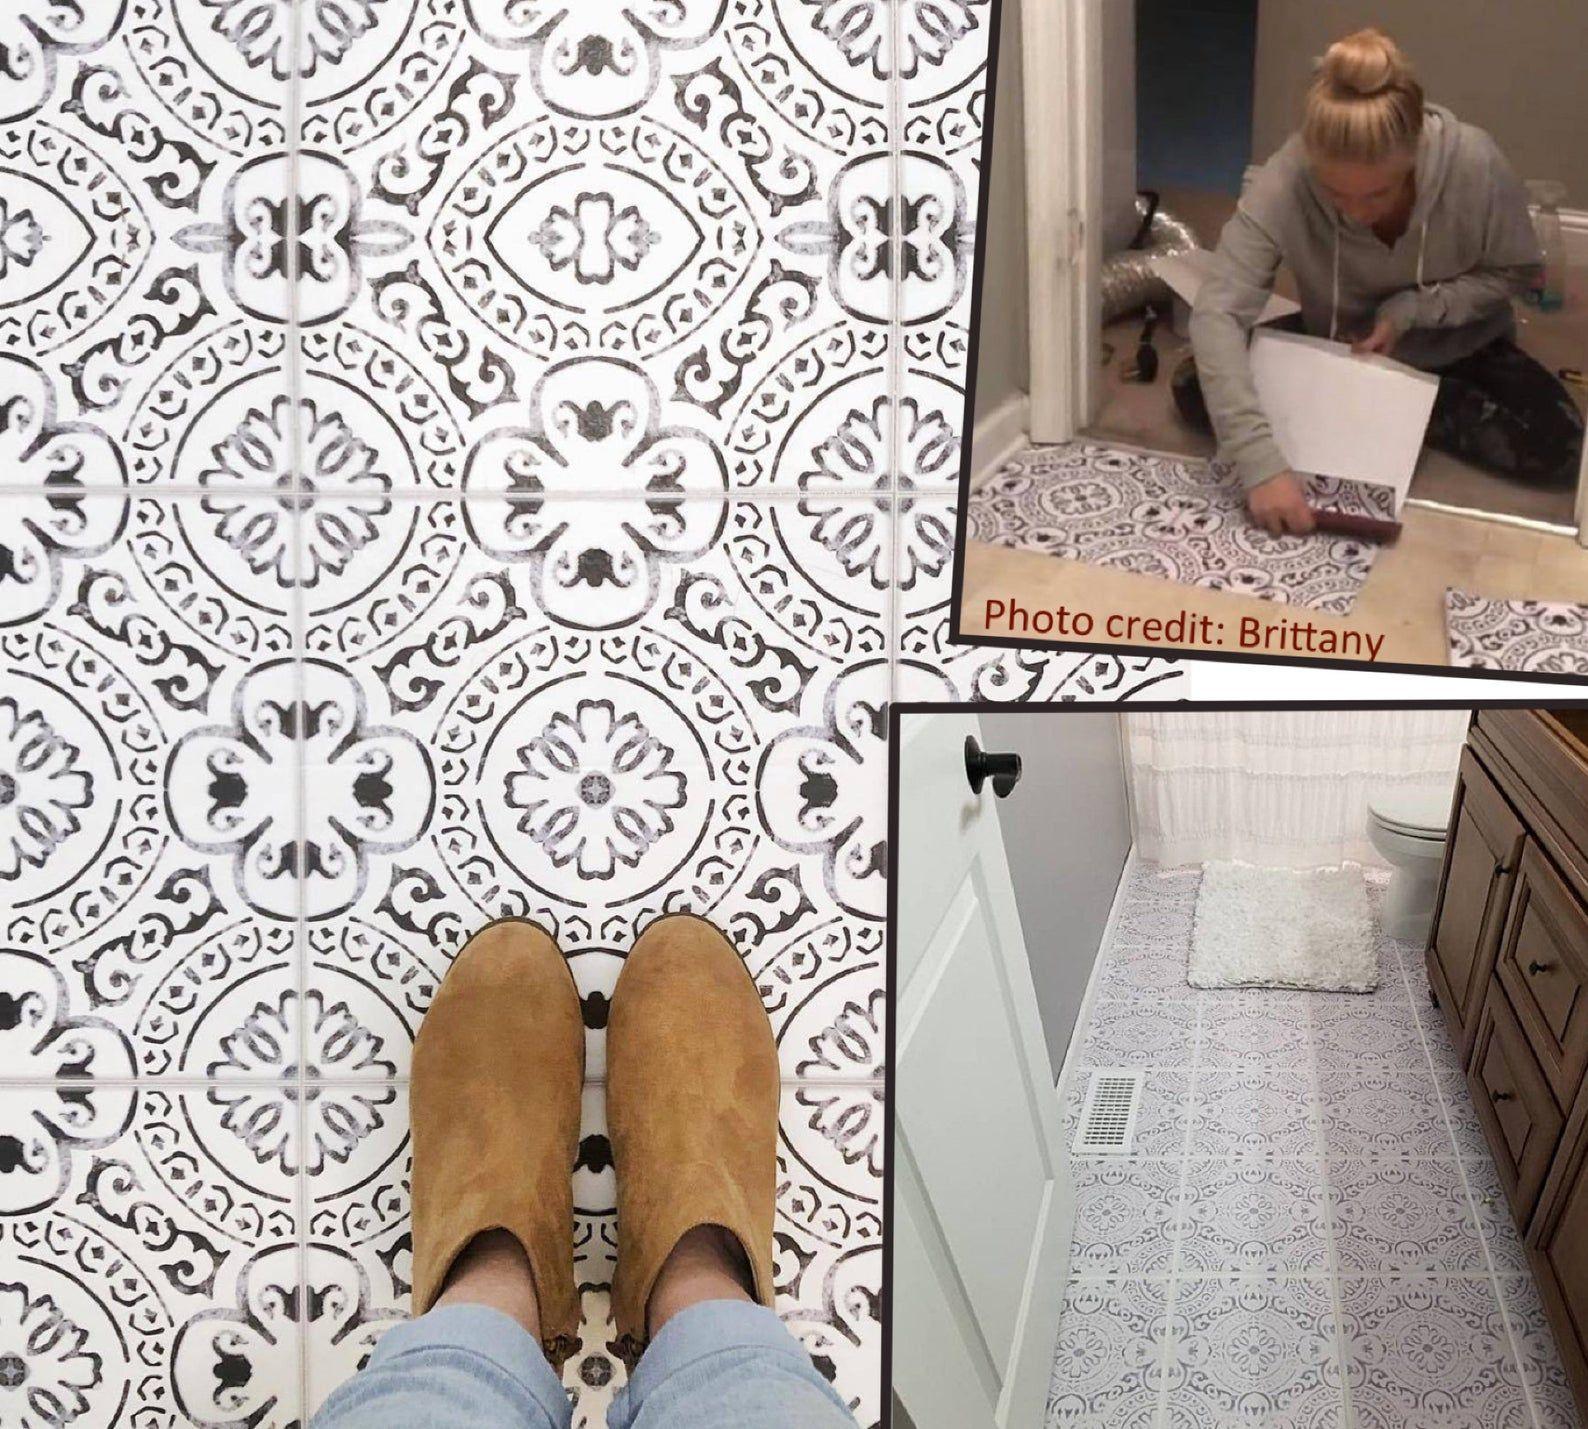 Tile Sticker Kitchen Bath Floor Wall Waterproof Removable Peel N Stick A72 Black White In 2020 Tile Stickers Kitchen Peel And Stick Floor Wall Waterproofing